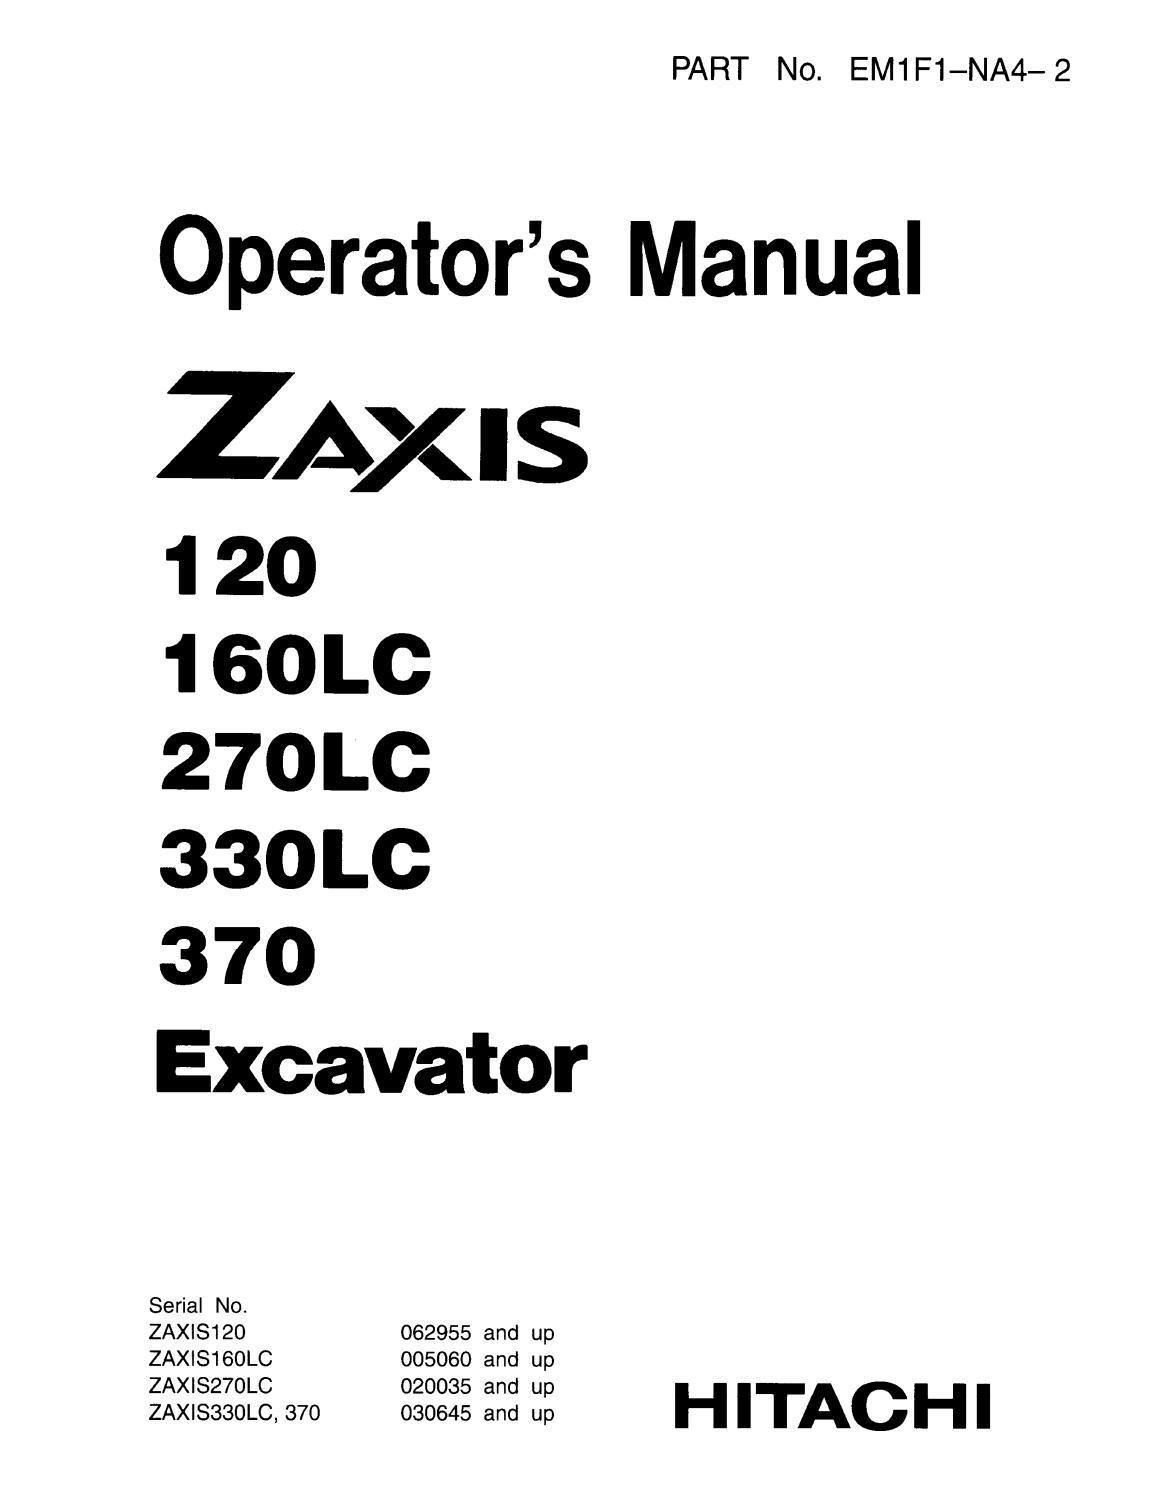 Hitachi Zaxis 370 Excavator operator's manual SN 030645